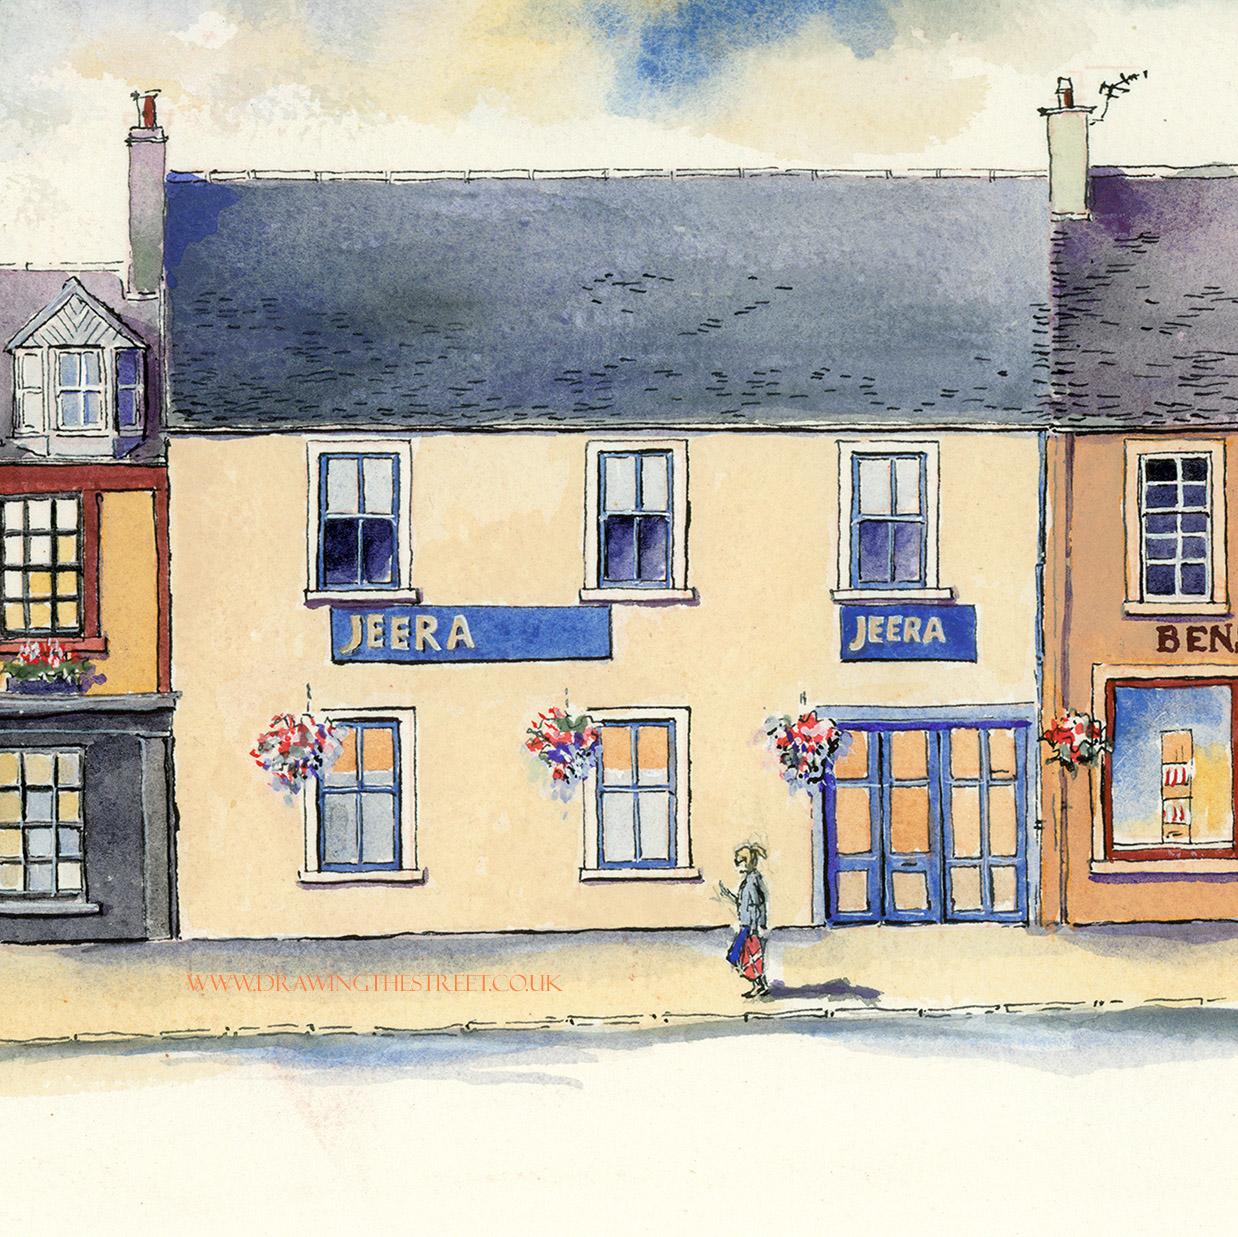 artwork of Jeera Indian Restaurant in Lanark by Ronnie Cruwys